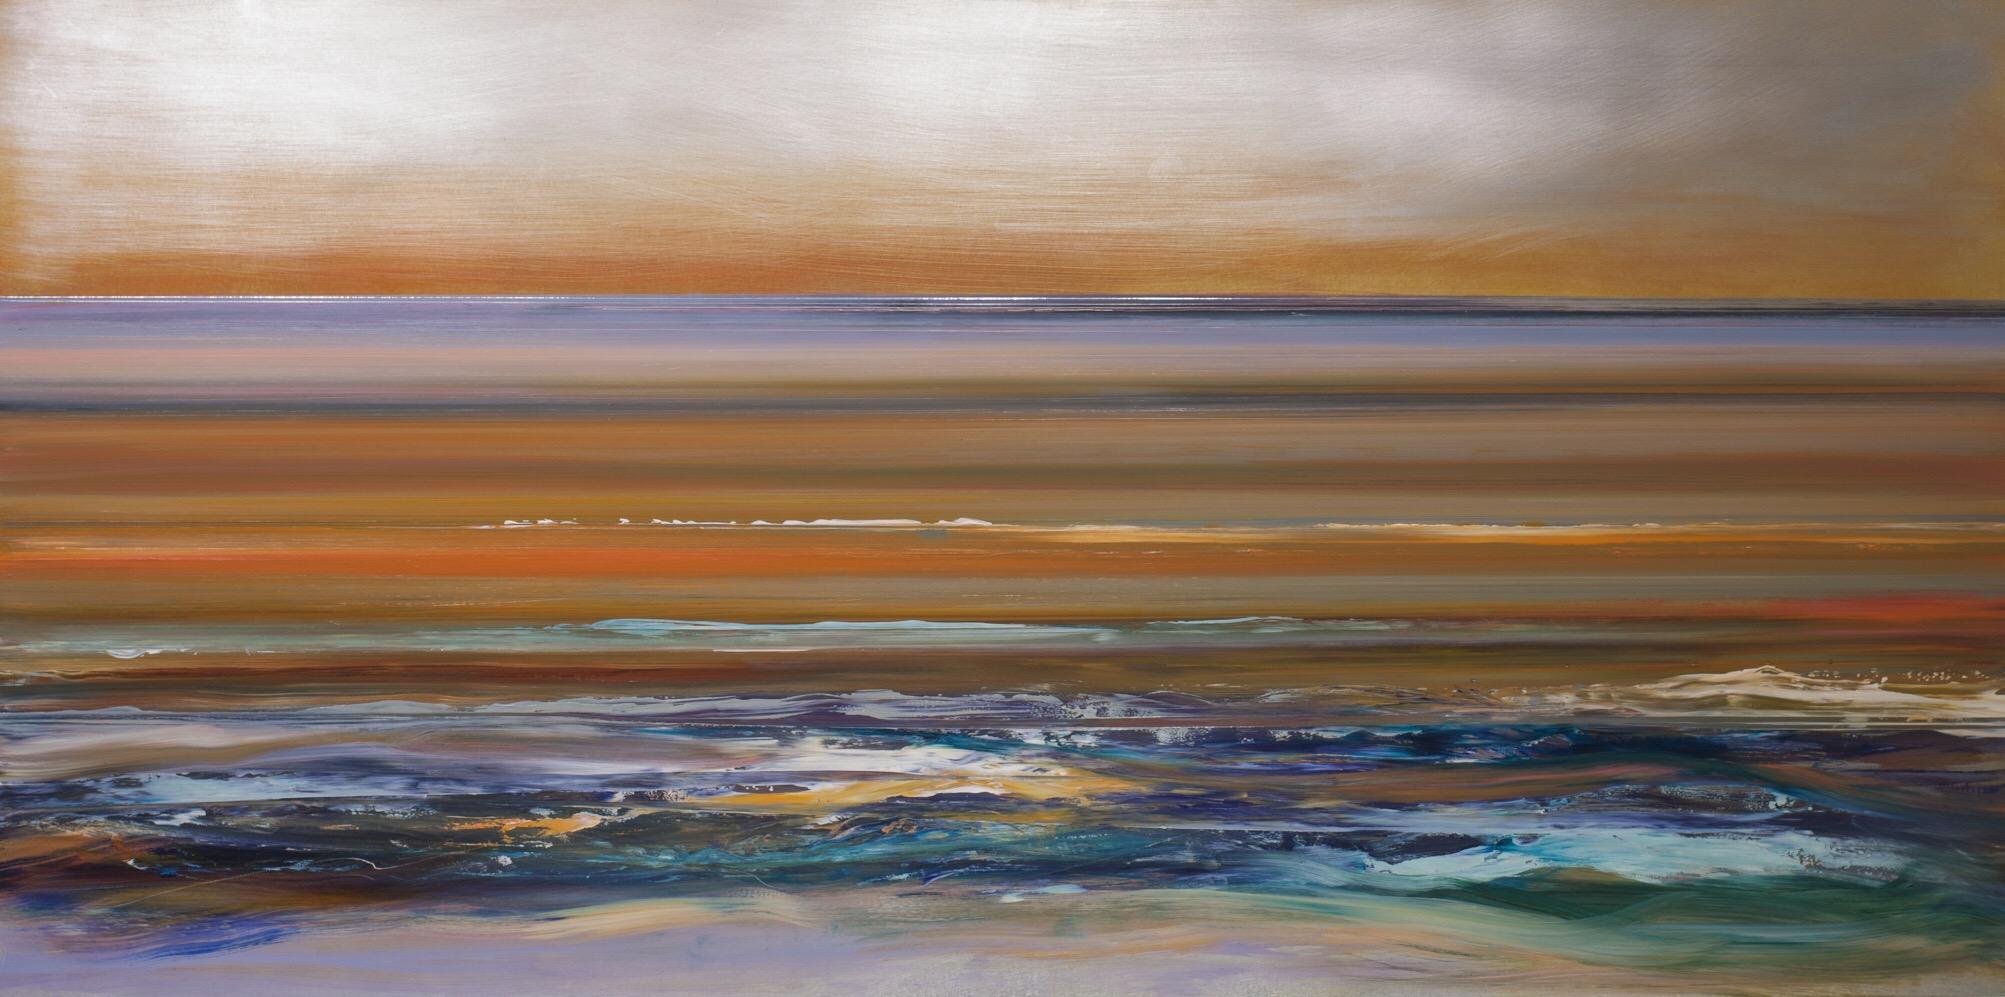 Watersplash Sunset (SOLD)